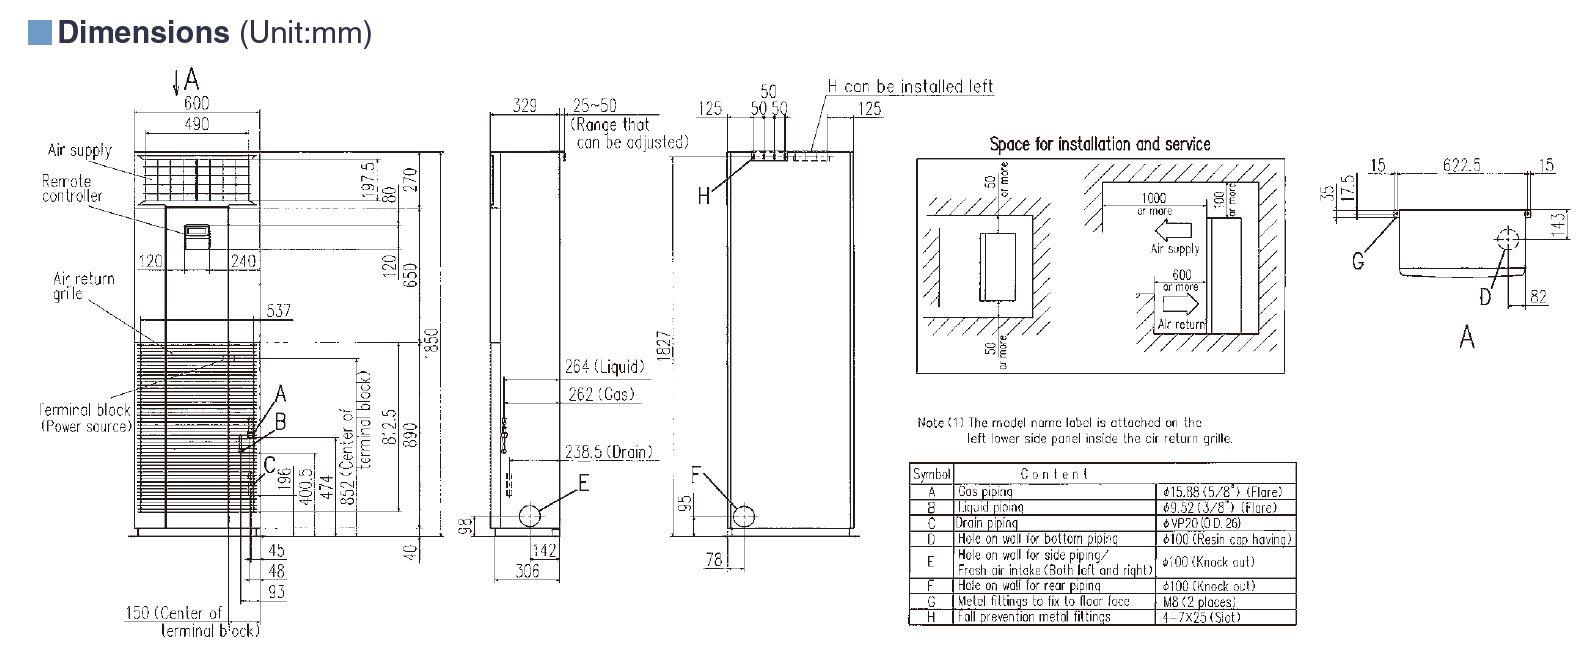 hight resolution of mitsubishi heat pump schematics wiring diagram mega mitsubishi heat pump user manual mitsubishi heat pump schematic